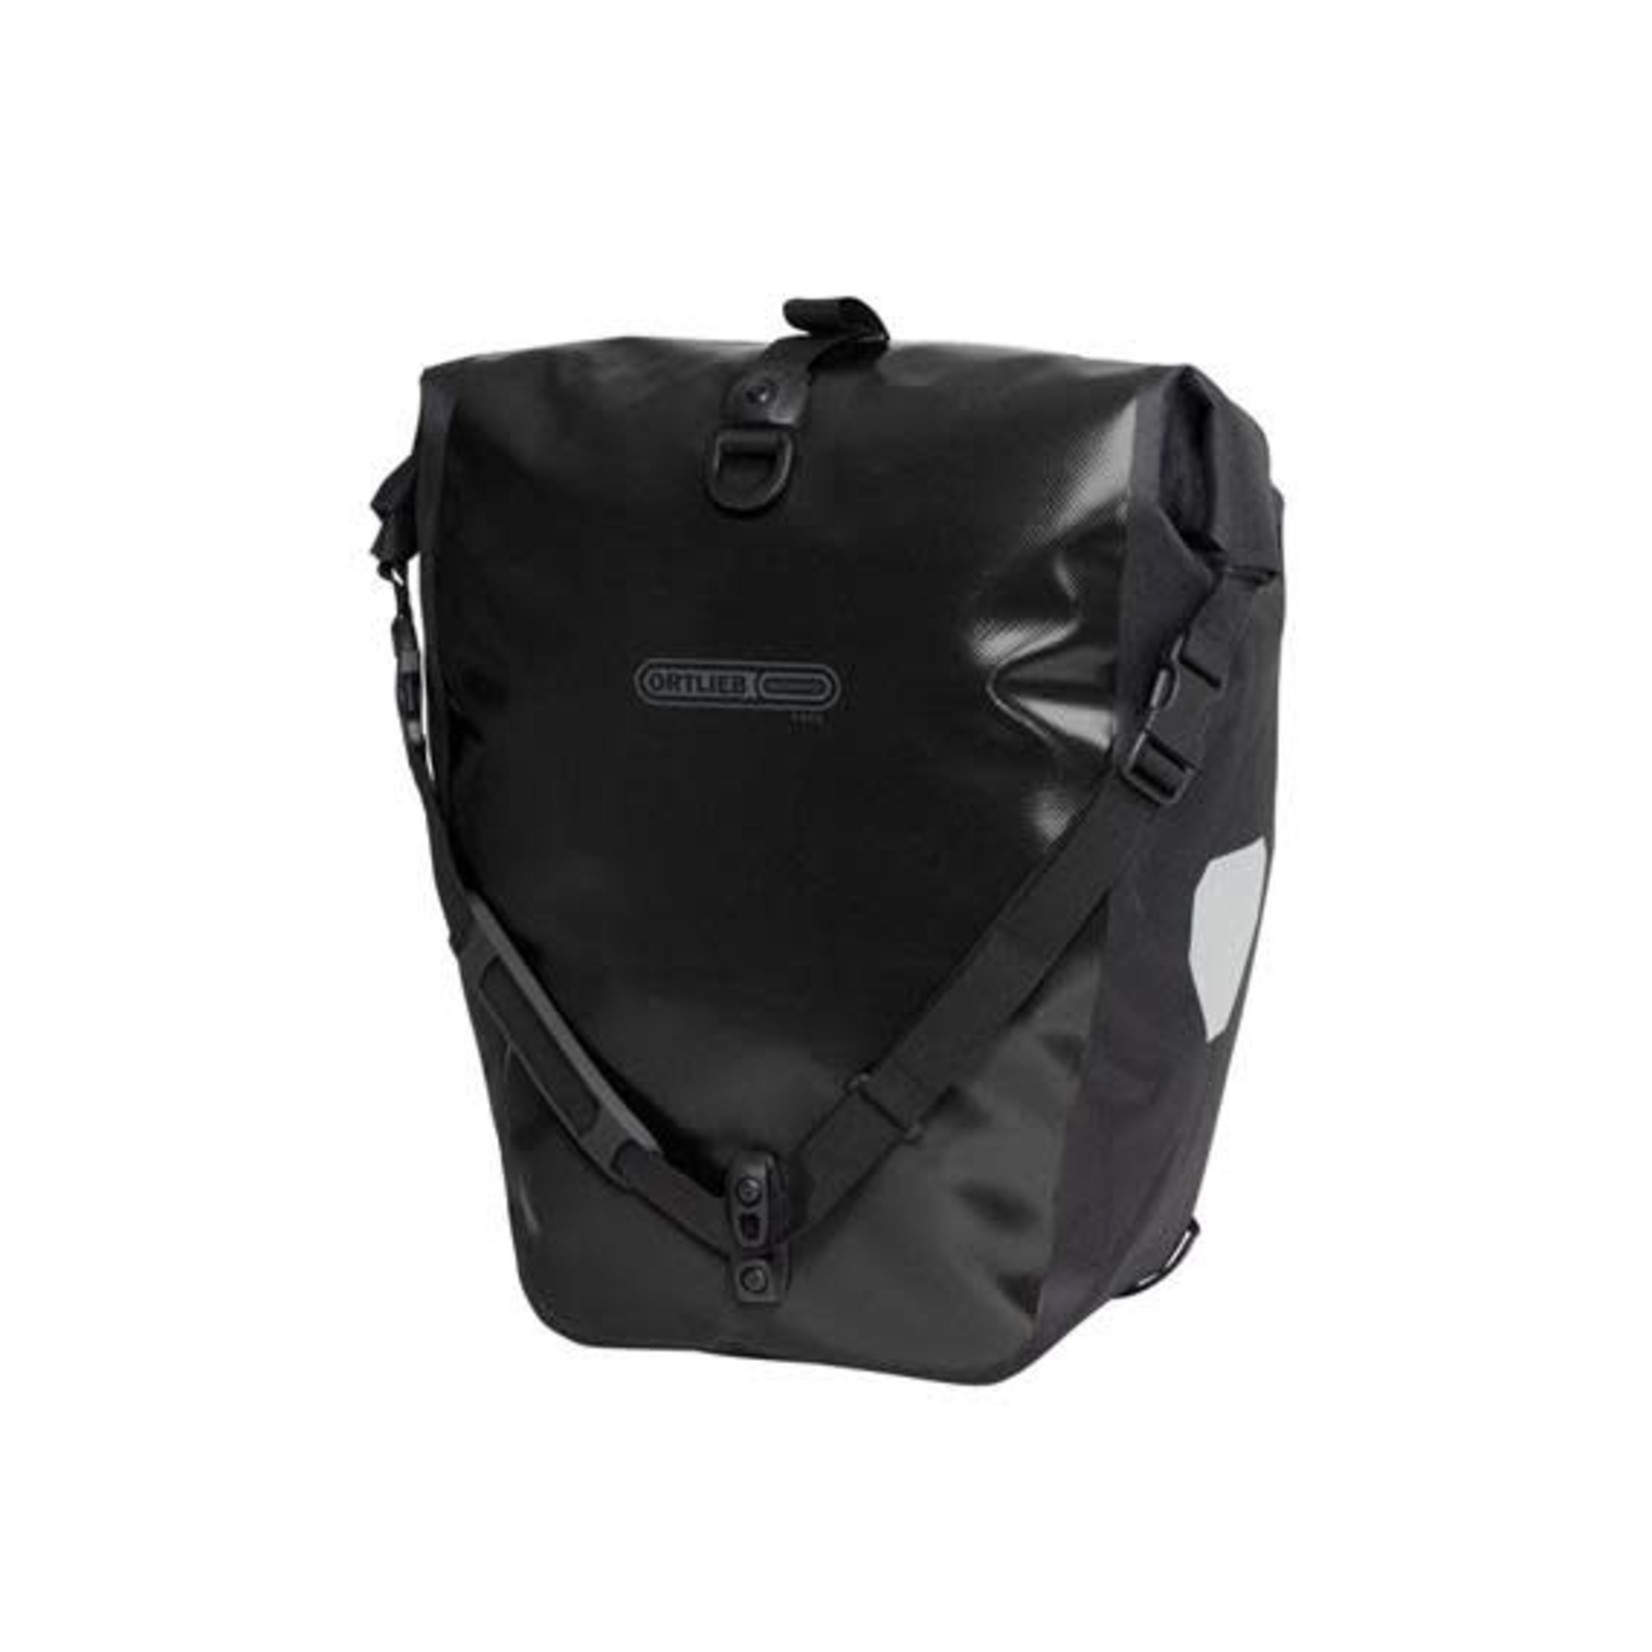 ORTLIEB ORTLIEB - Back-Roller Free Black